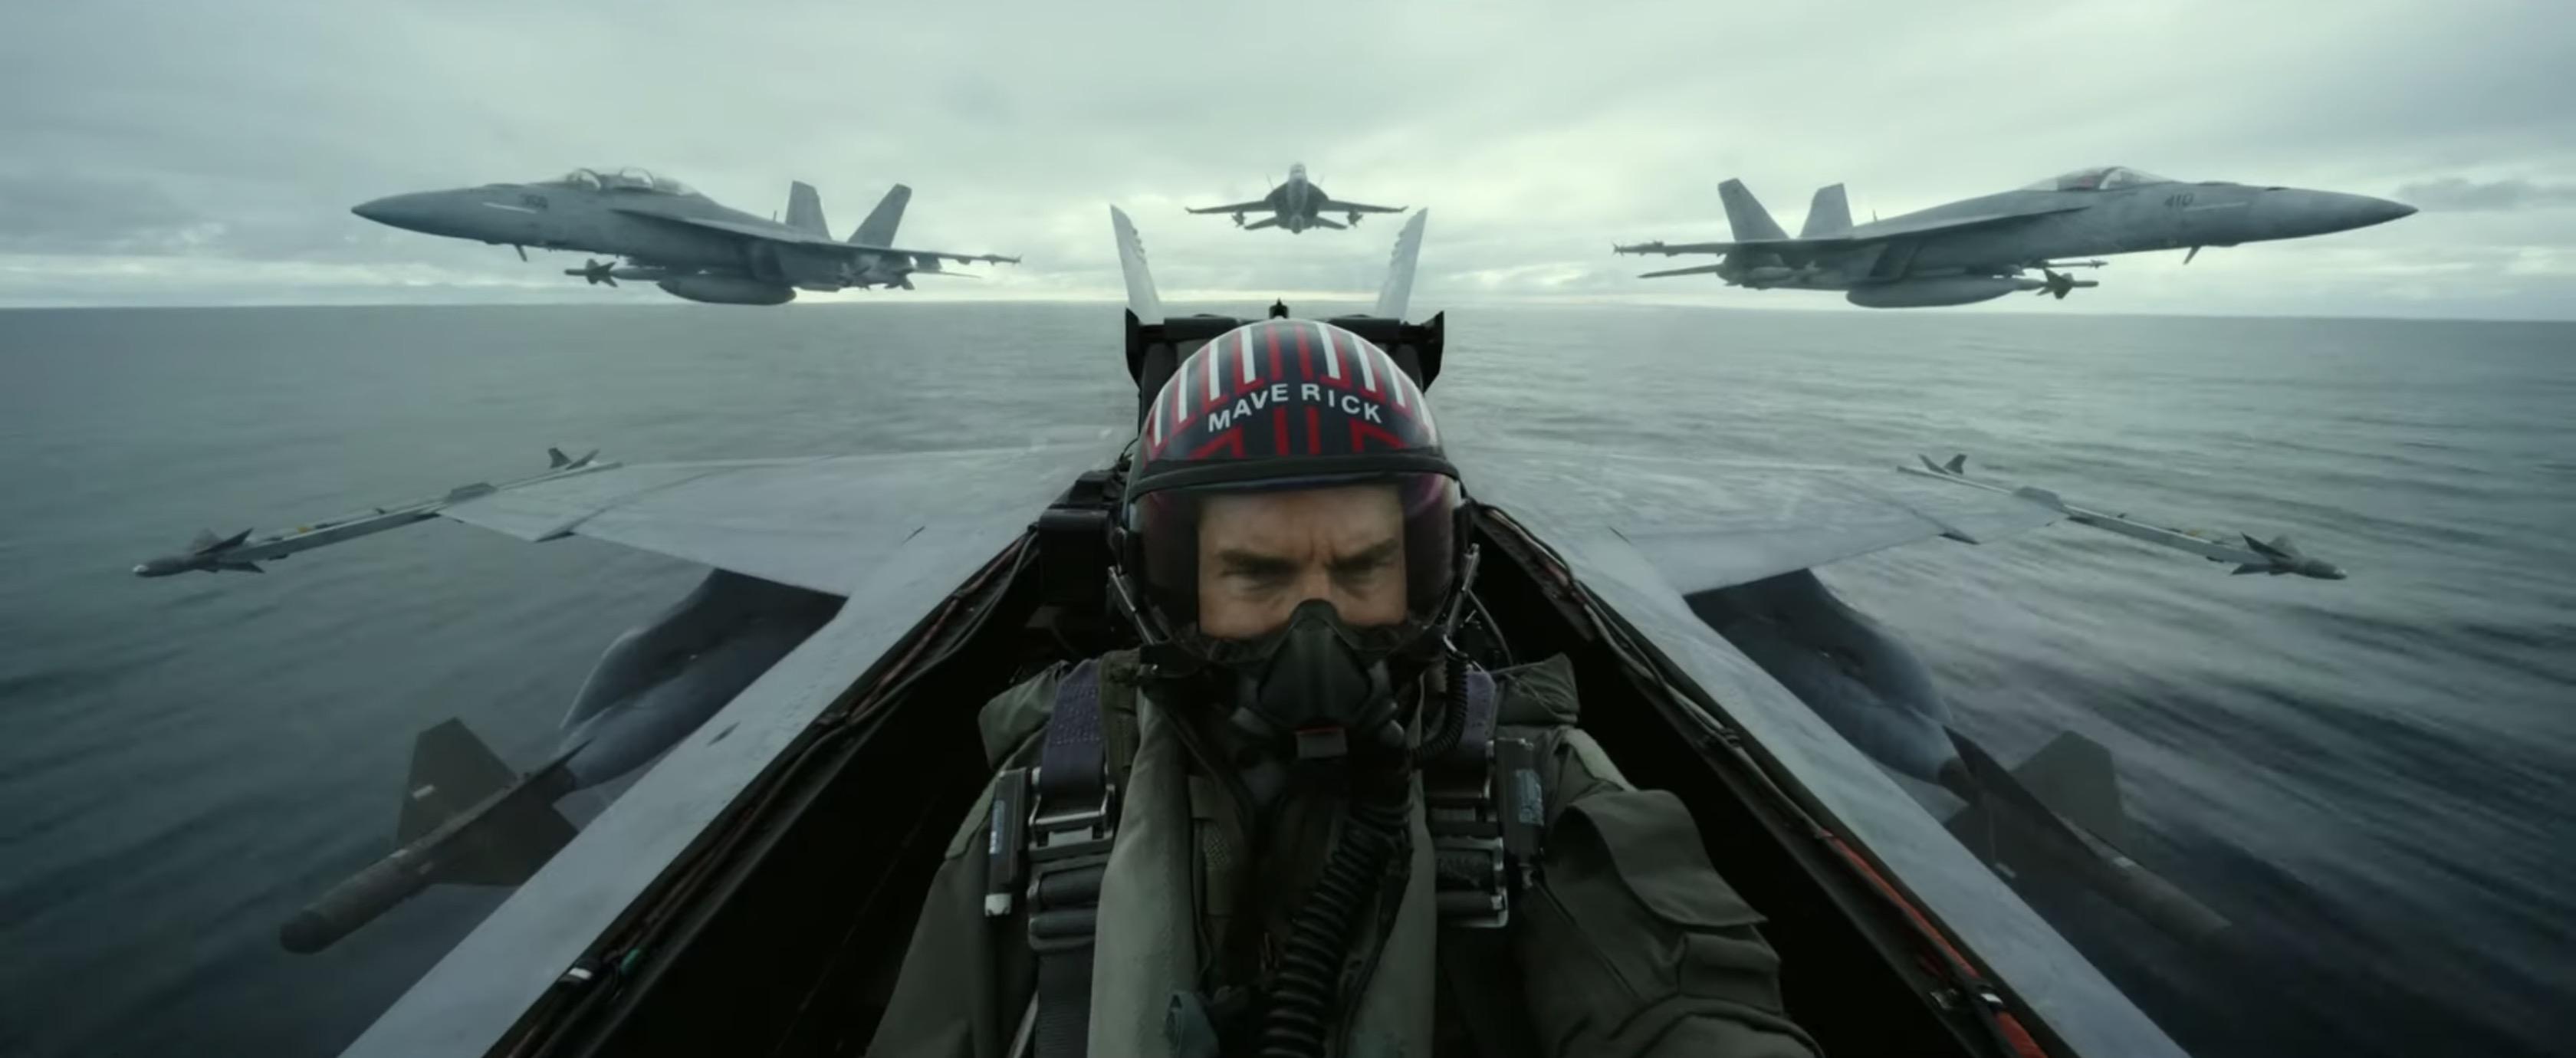 'Top Gun: Maverick' Brings Back Original Co-Editor Chris Lebenzon